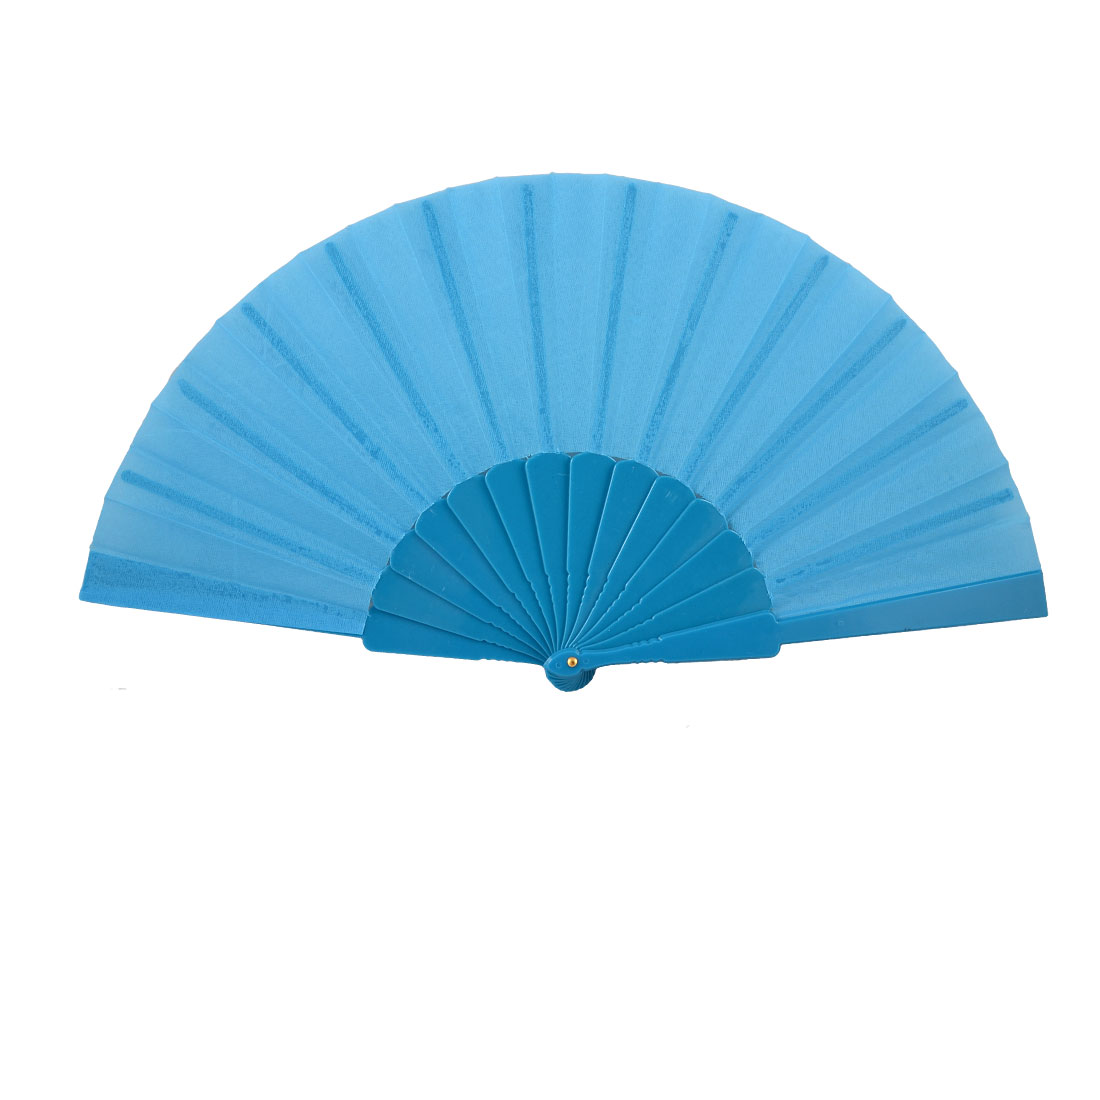 "Unisex Plastic Frame 16.5"" Width Fabric Folding Hand Fan Gift Blue"